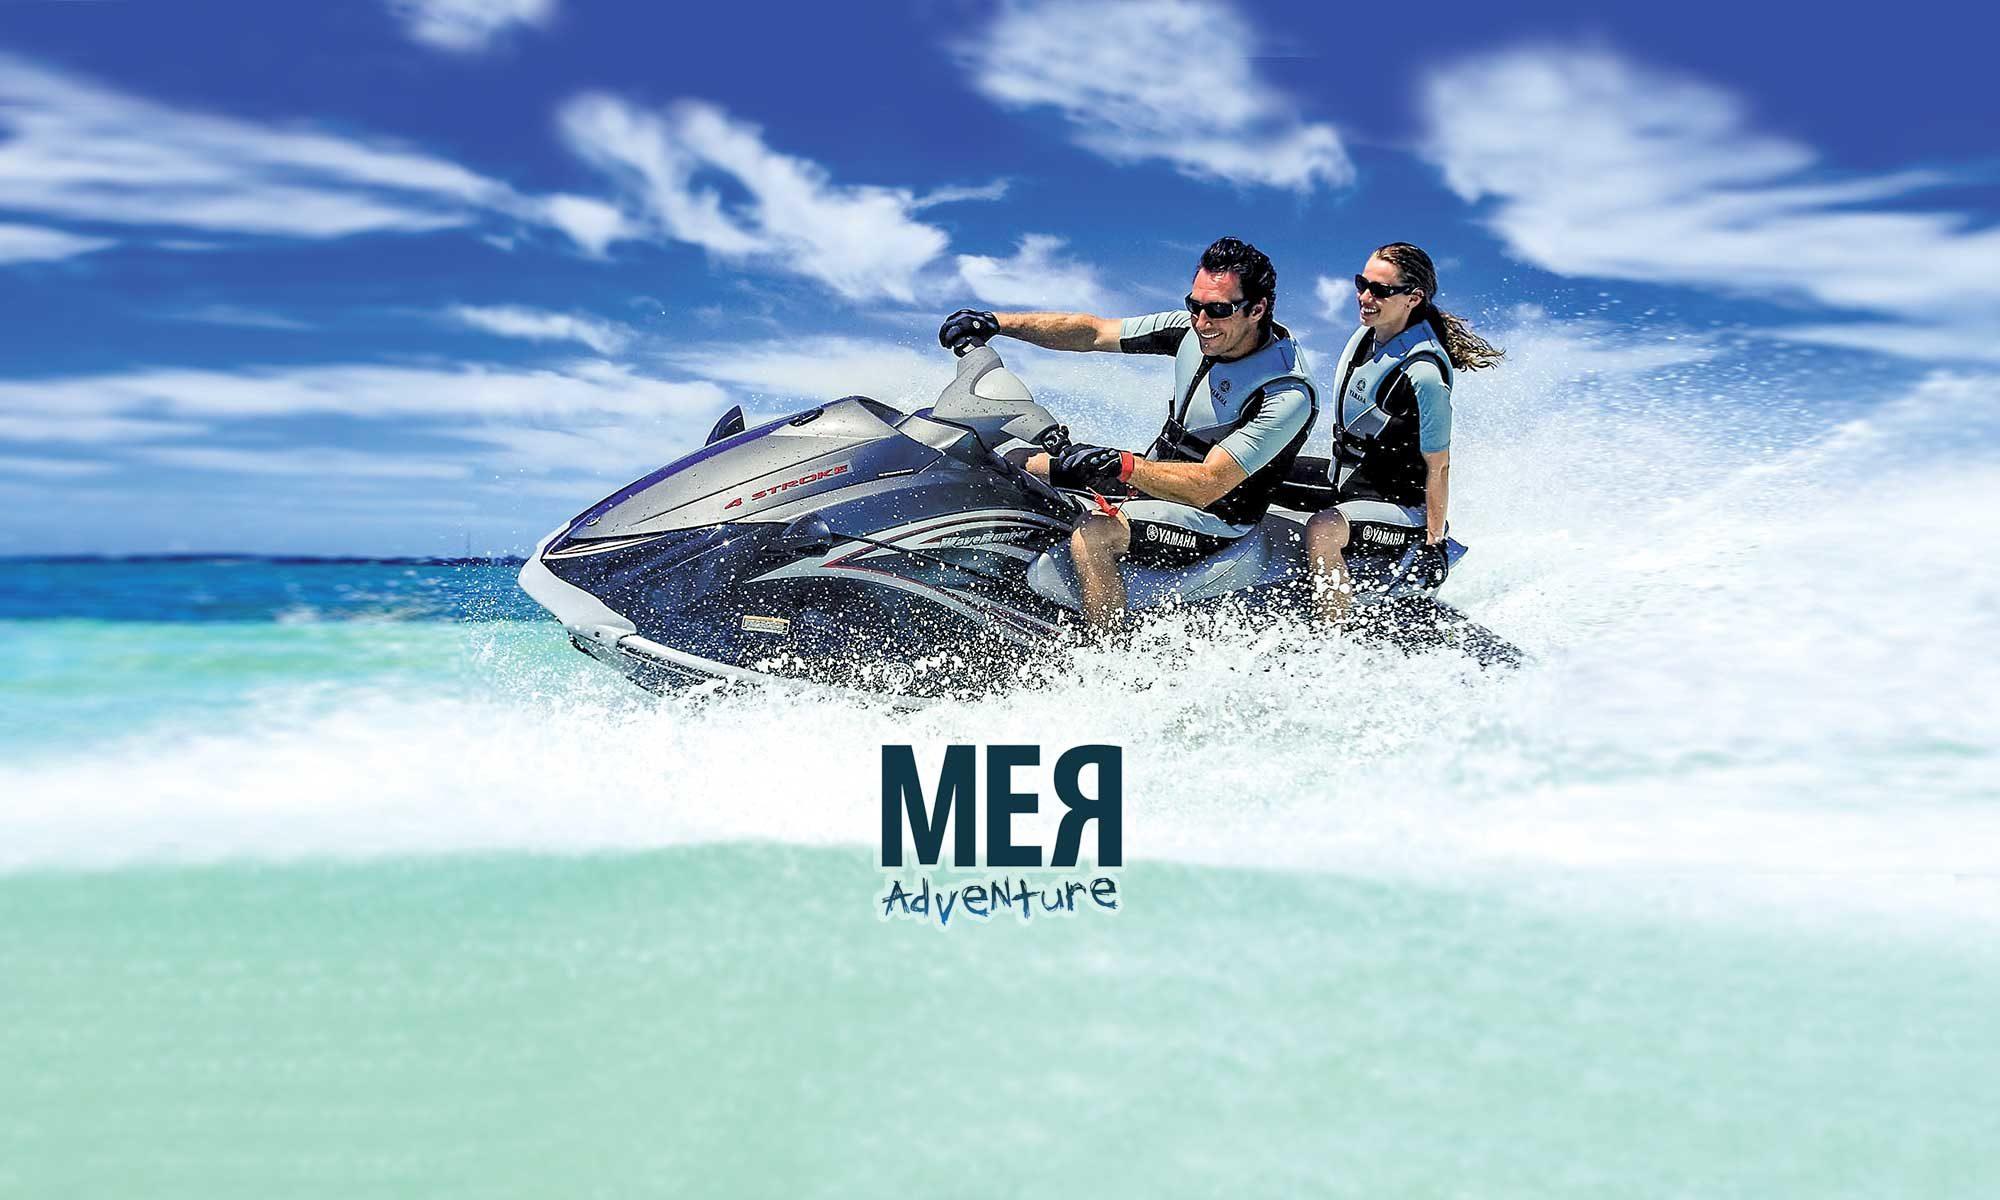 Mer Adventure